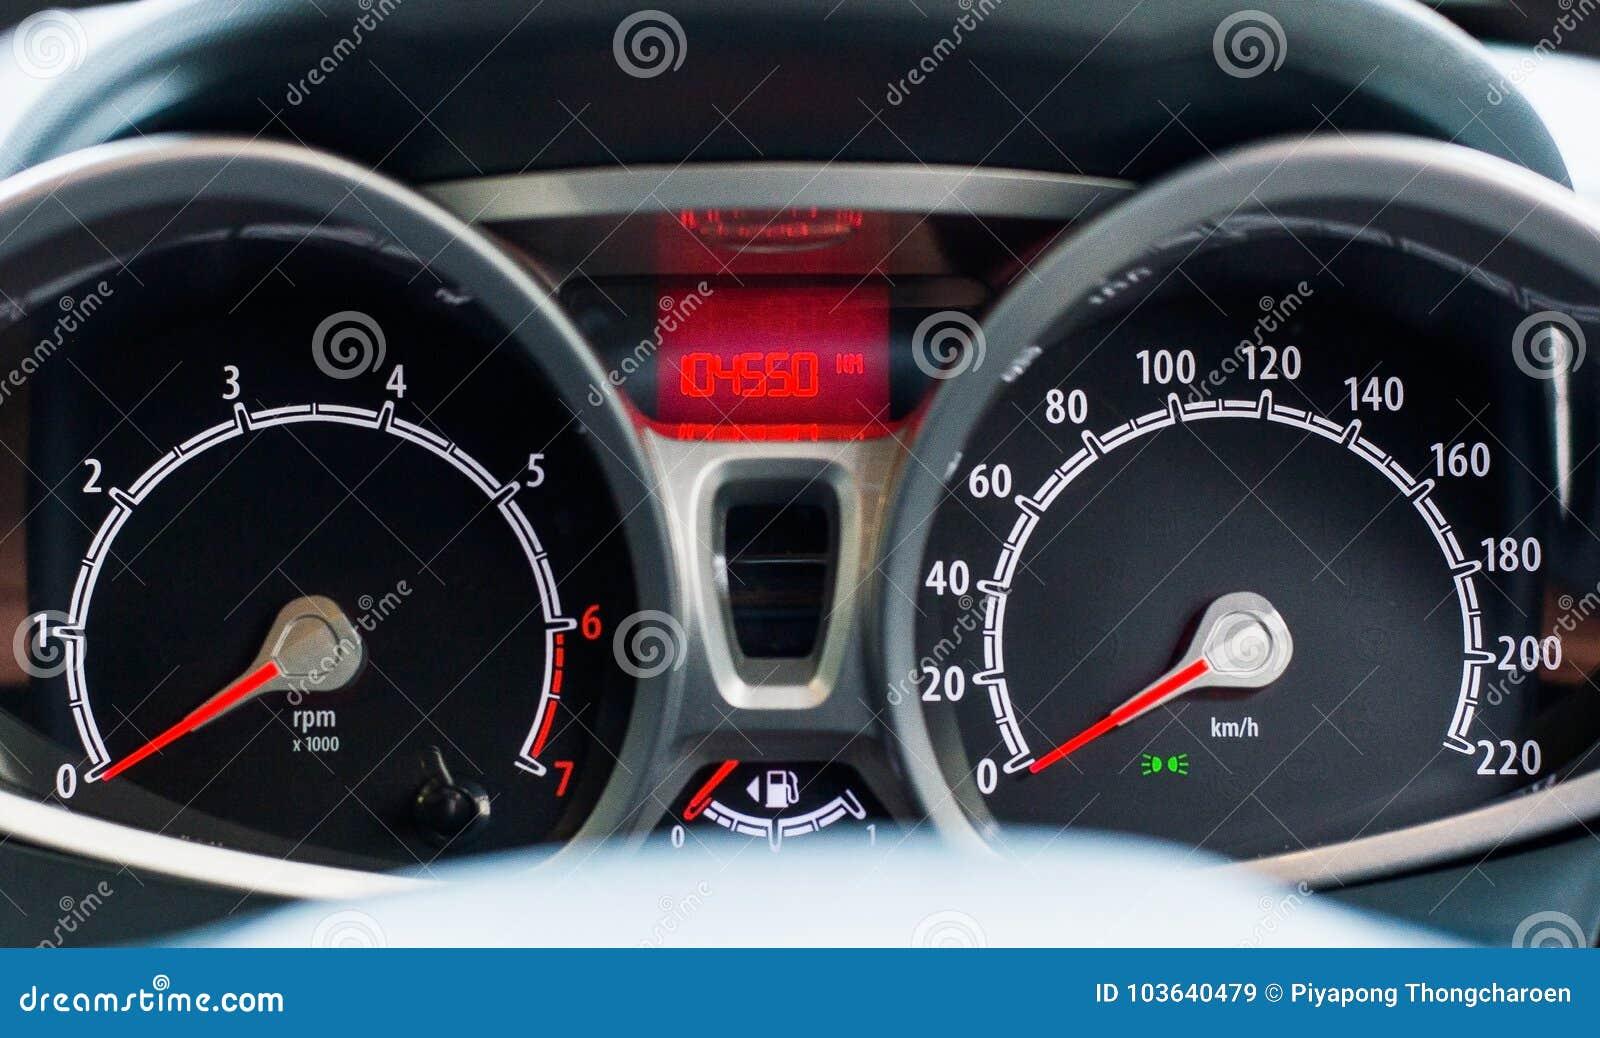 A Speed Meter Is Gauge That Measures And Displayscar Dashboard